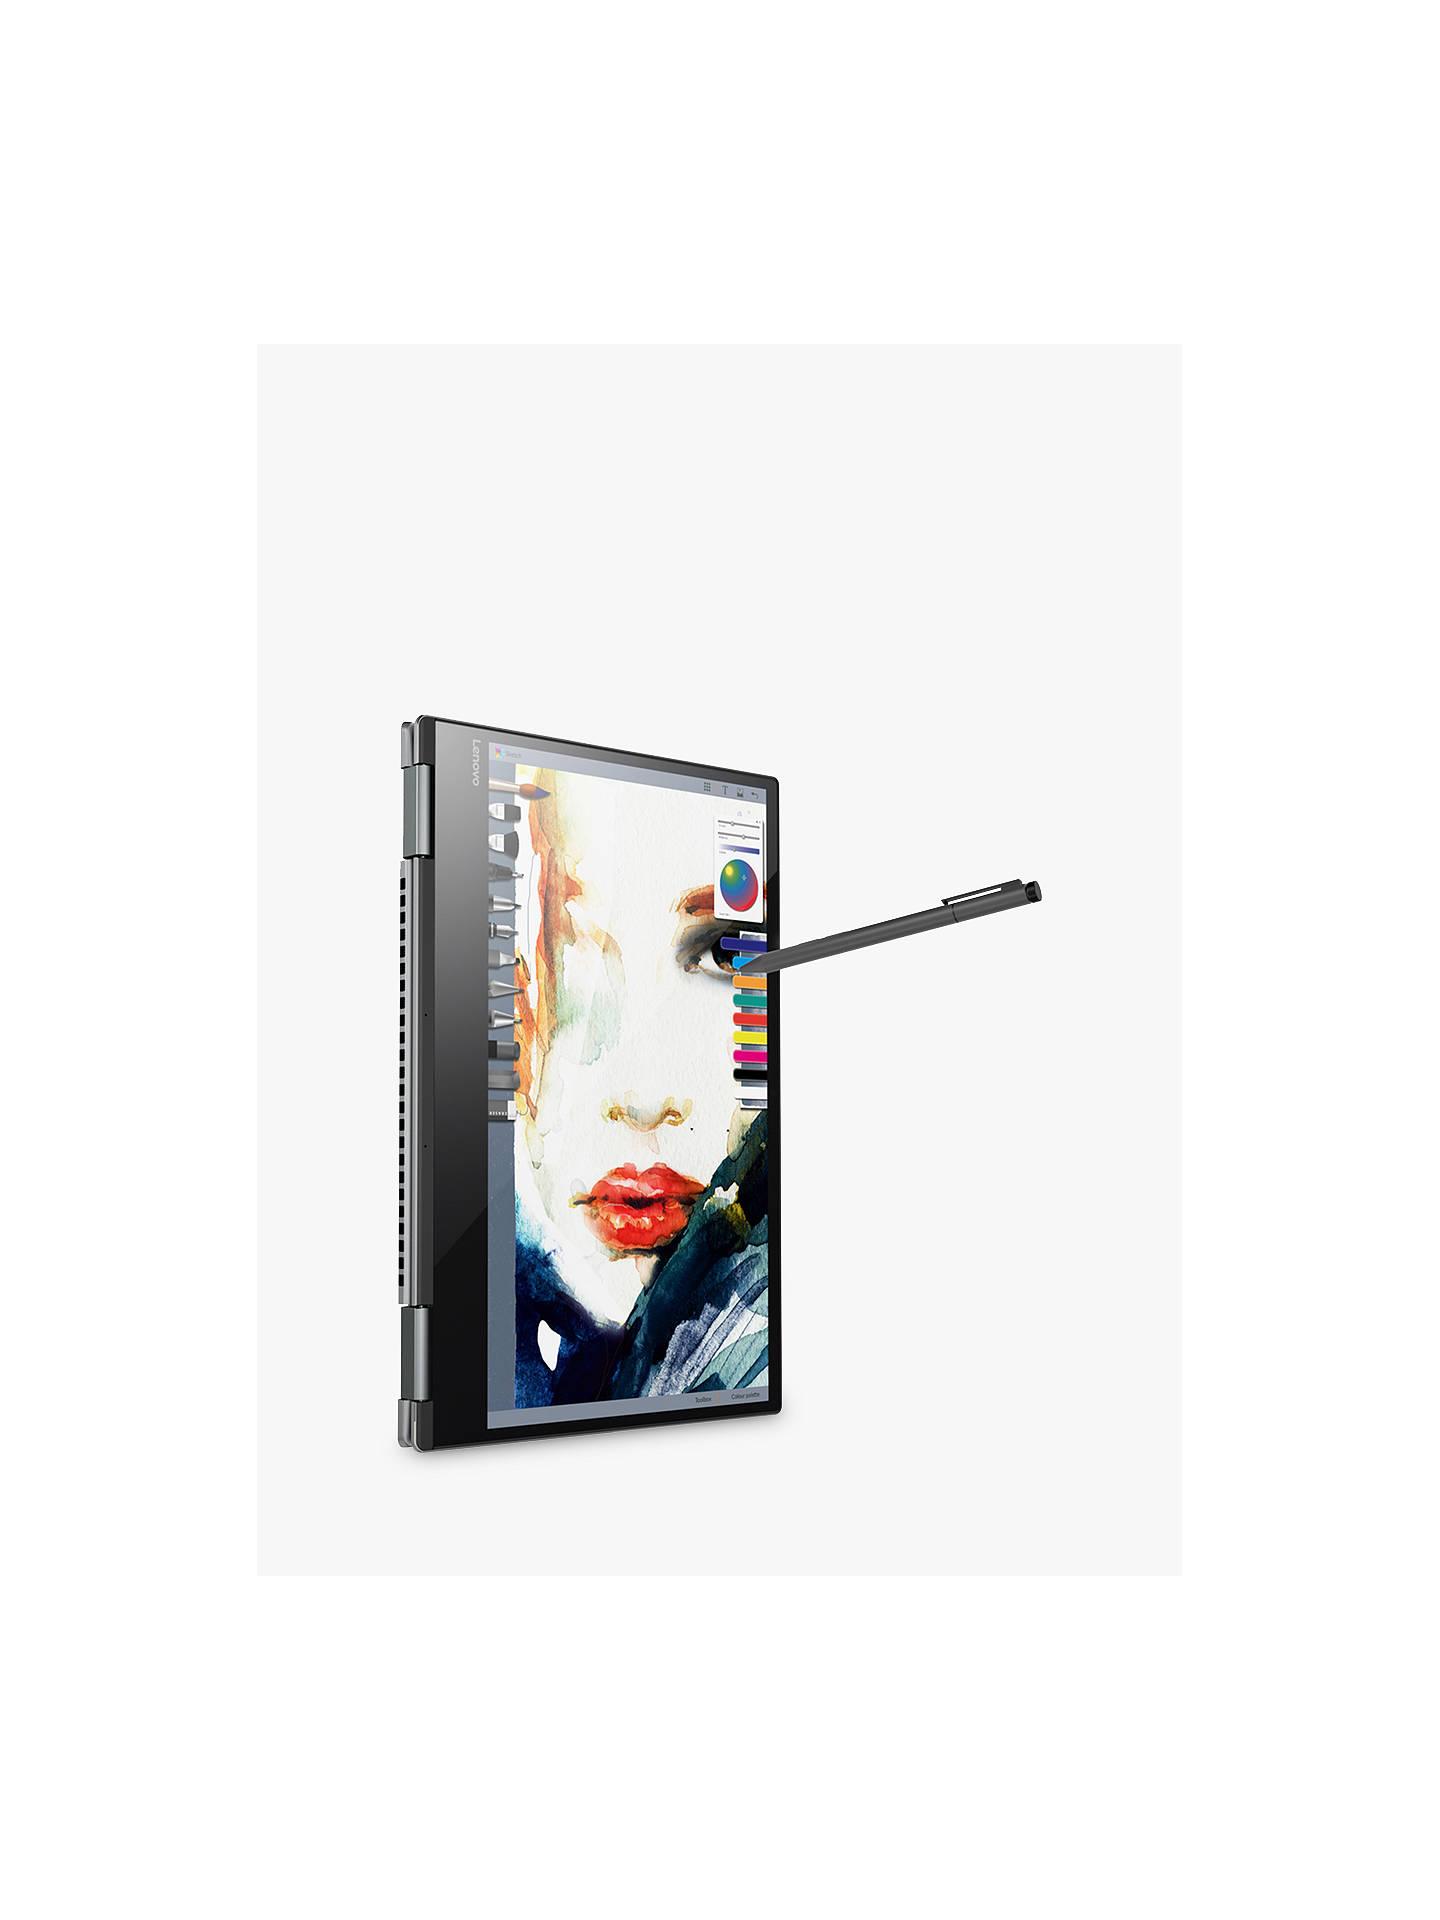 "Lenovo Yoga 720 Convertible Laptop with Active Pen, Intel Core i7, 8GB RAM,  256GB SSD, 13 3"" Full HD, Iron Grey"